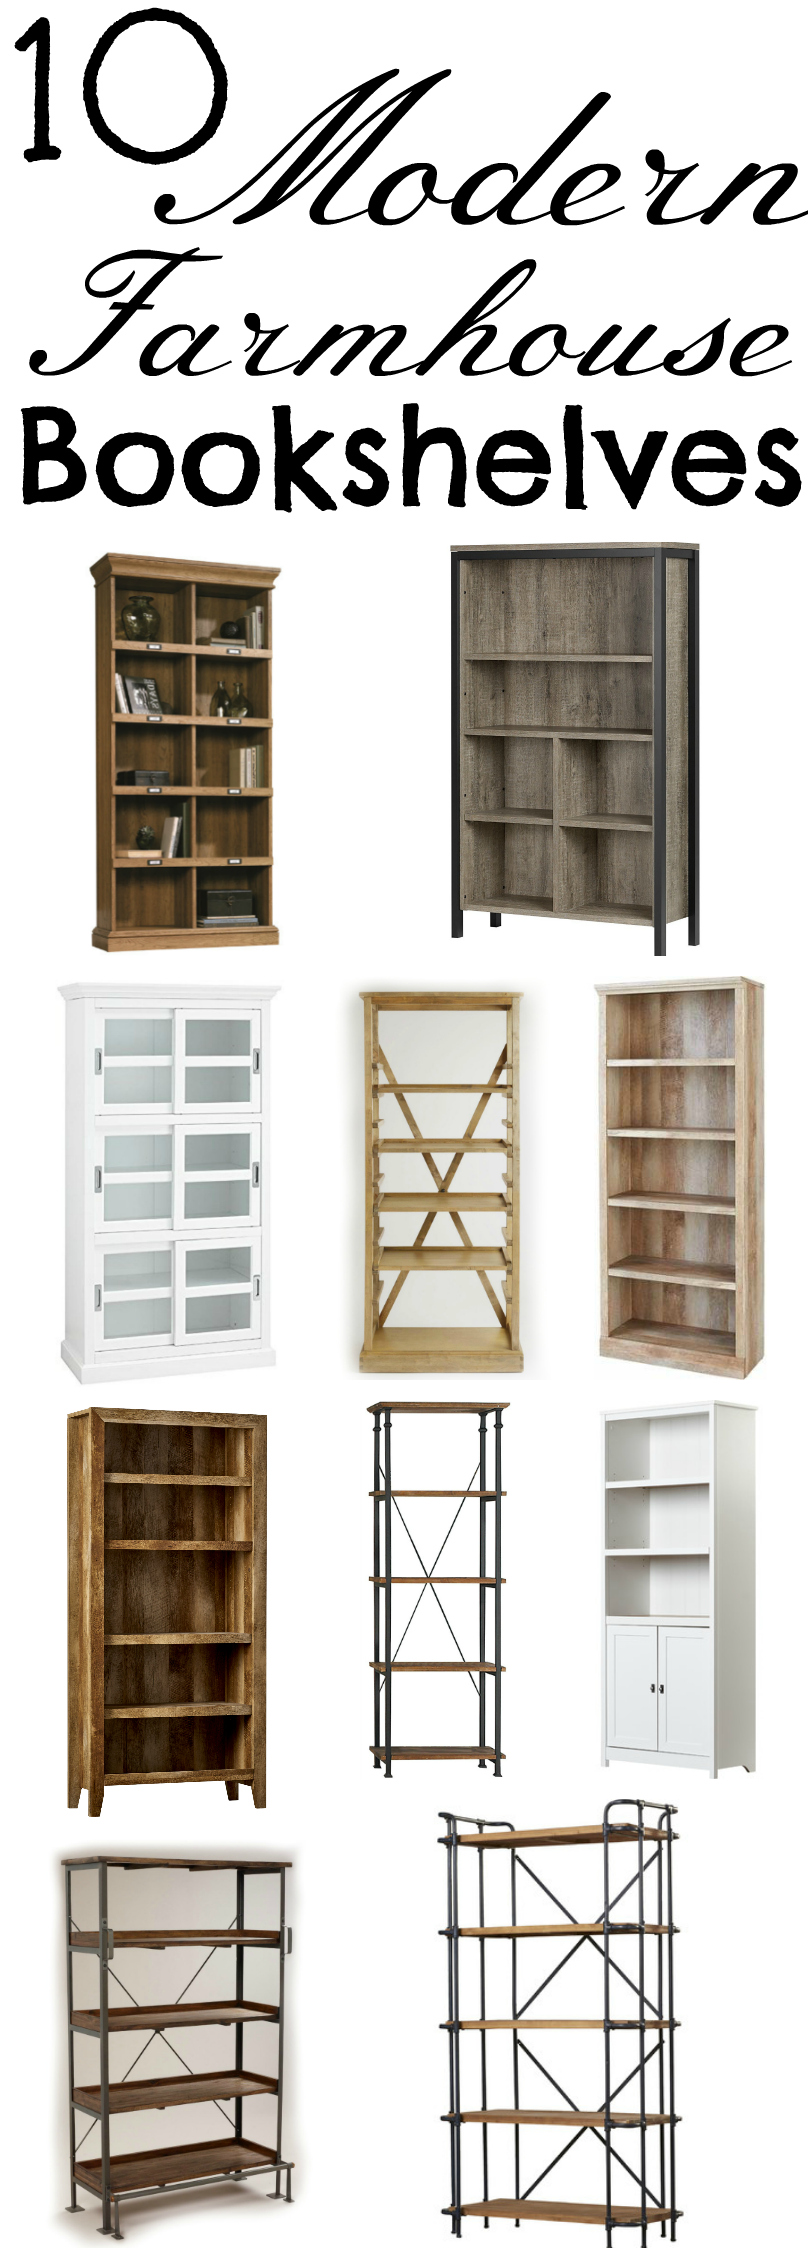 10 Modern Farmhouse Bookshelves for a Fixer Upper Farmhouse Look